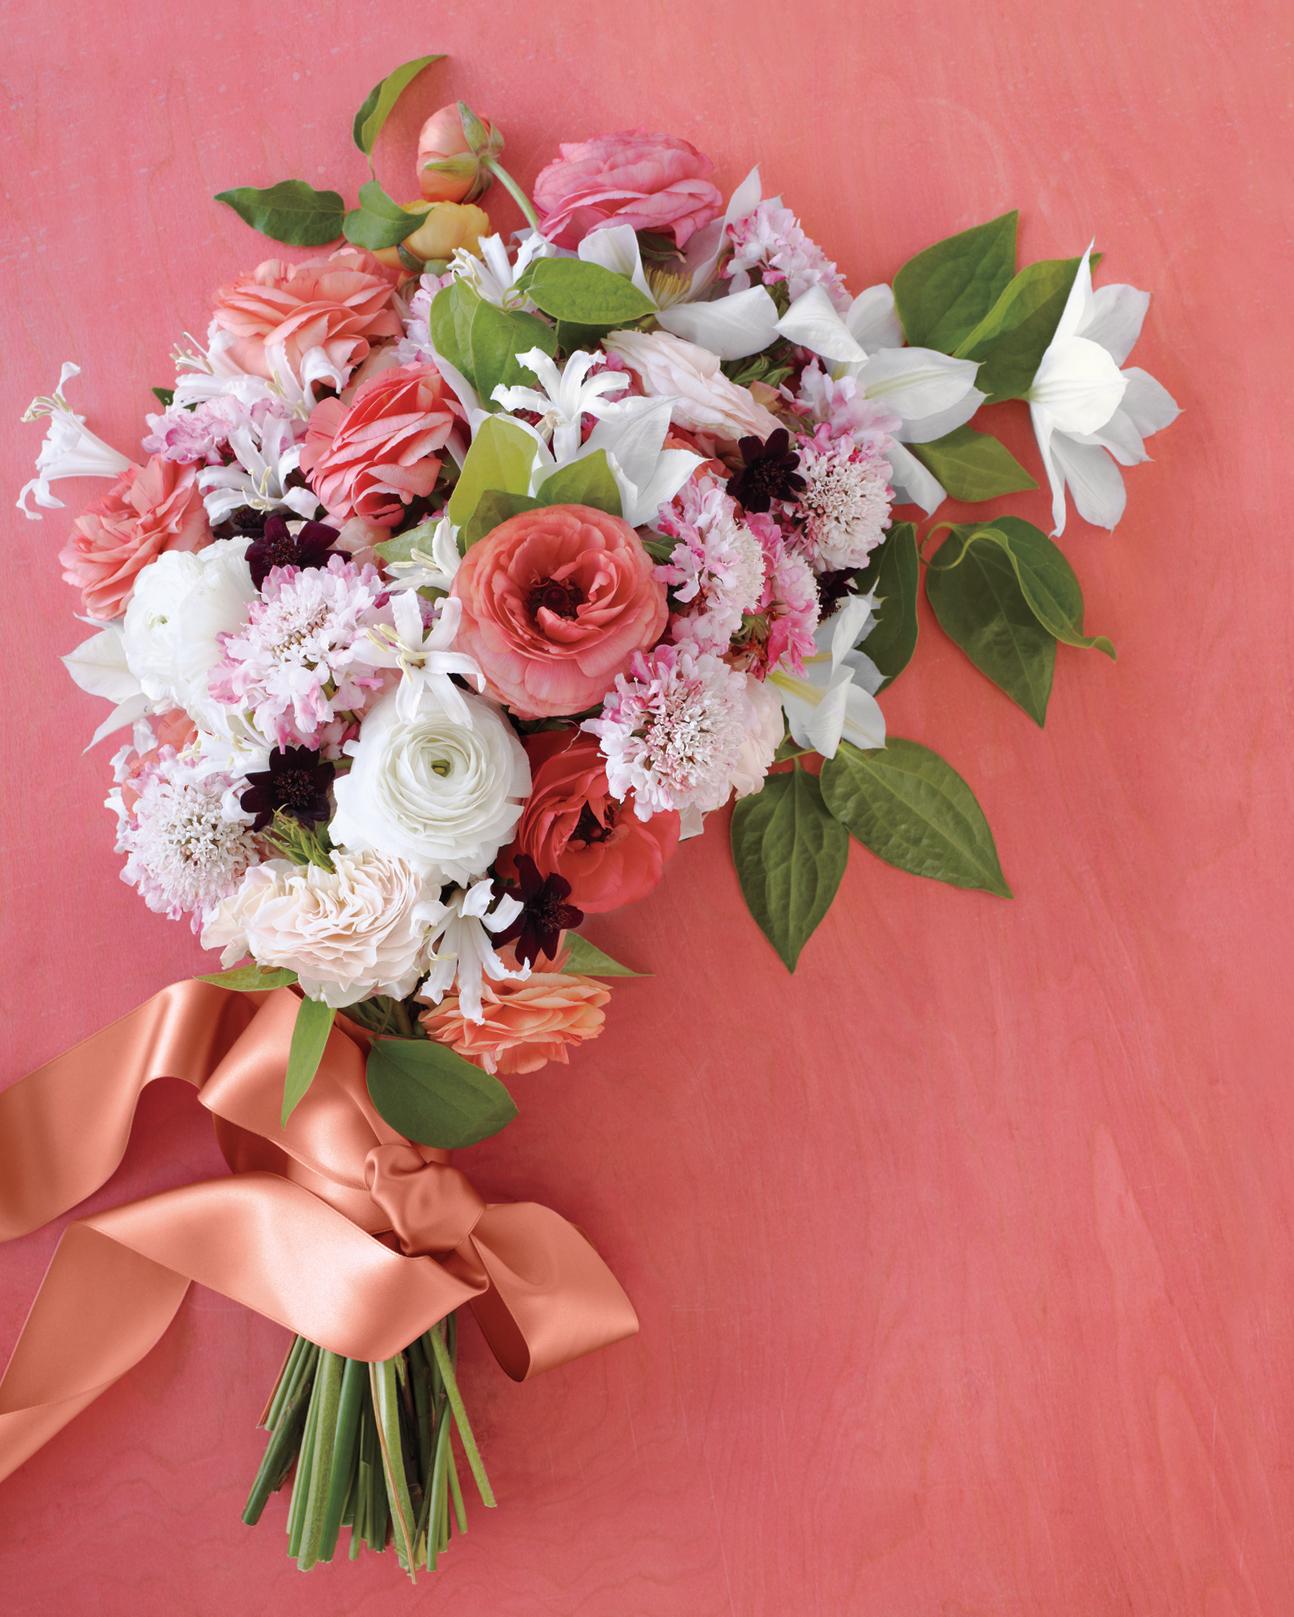 fabric-flowers-chintzb2-md108763.jpg